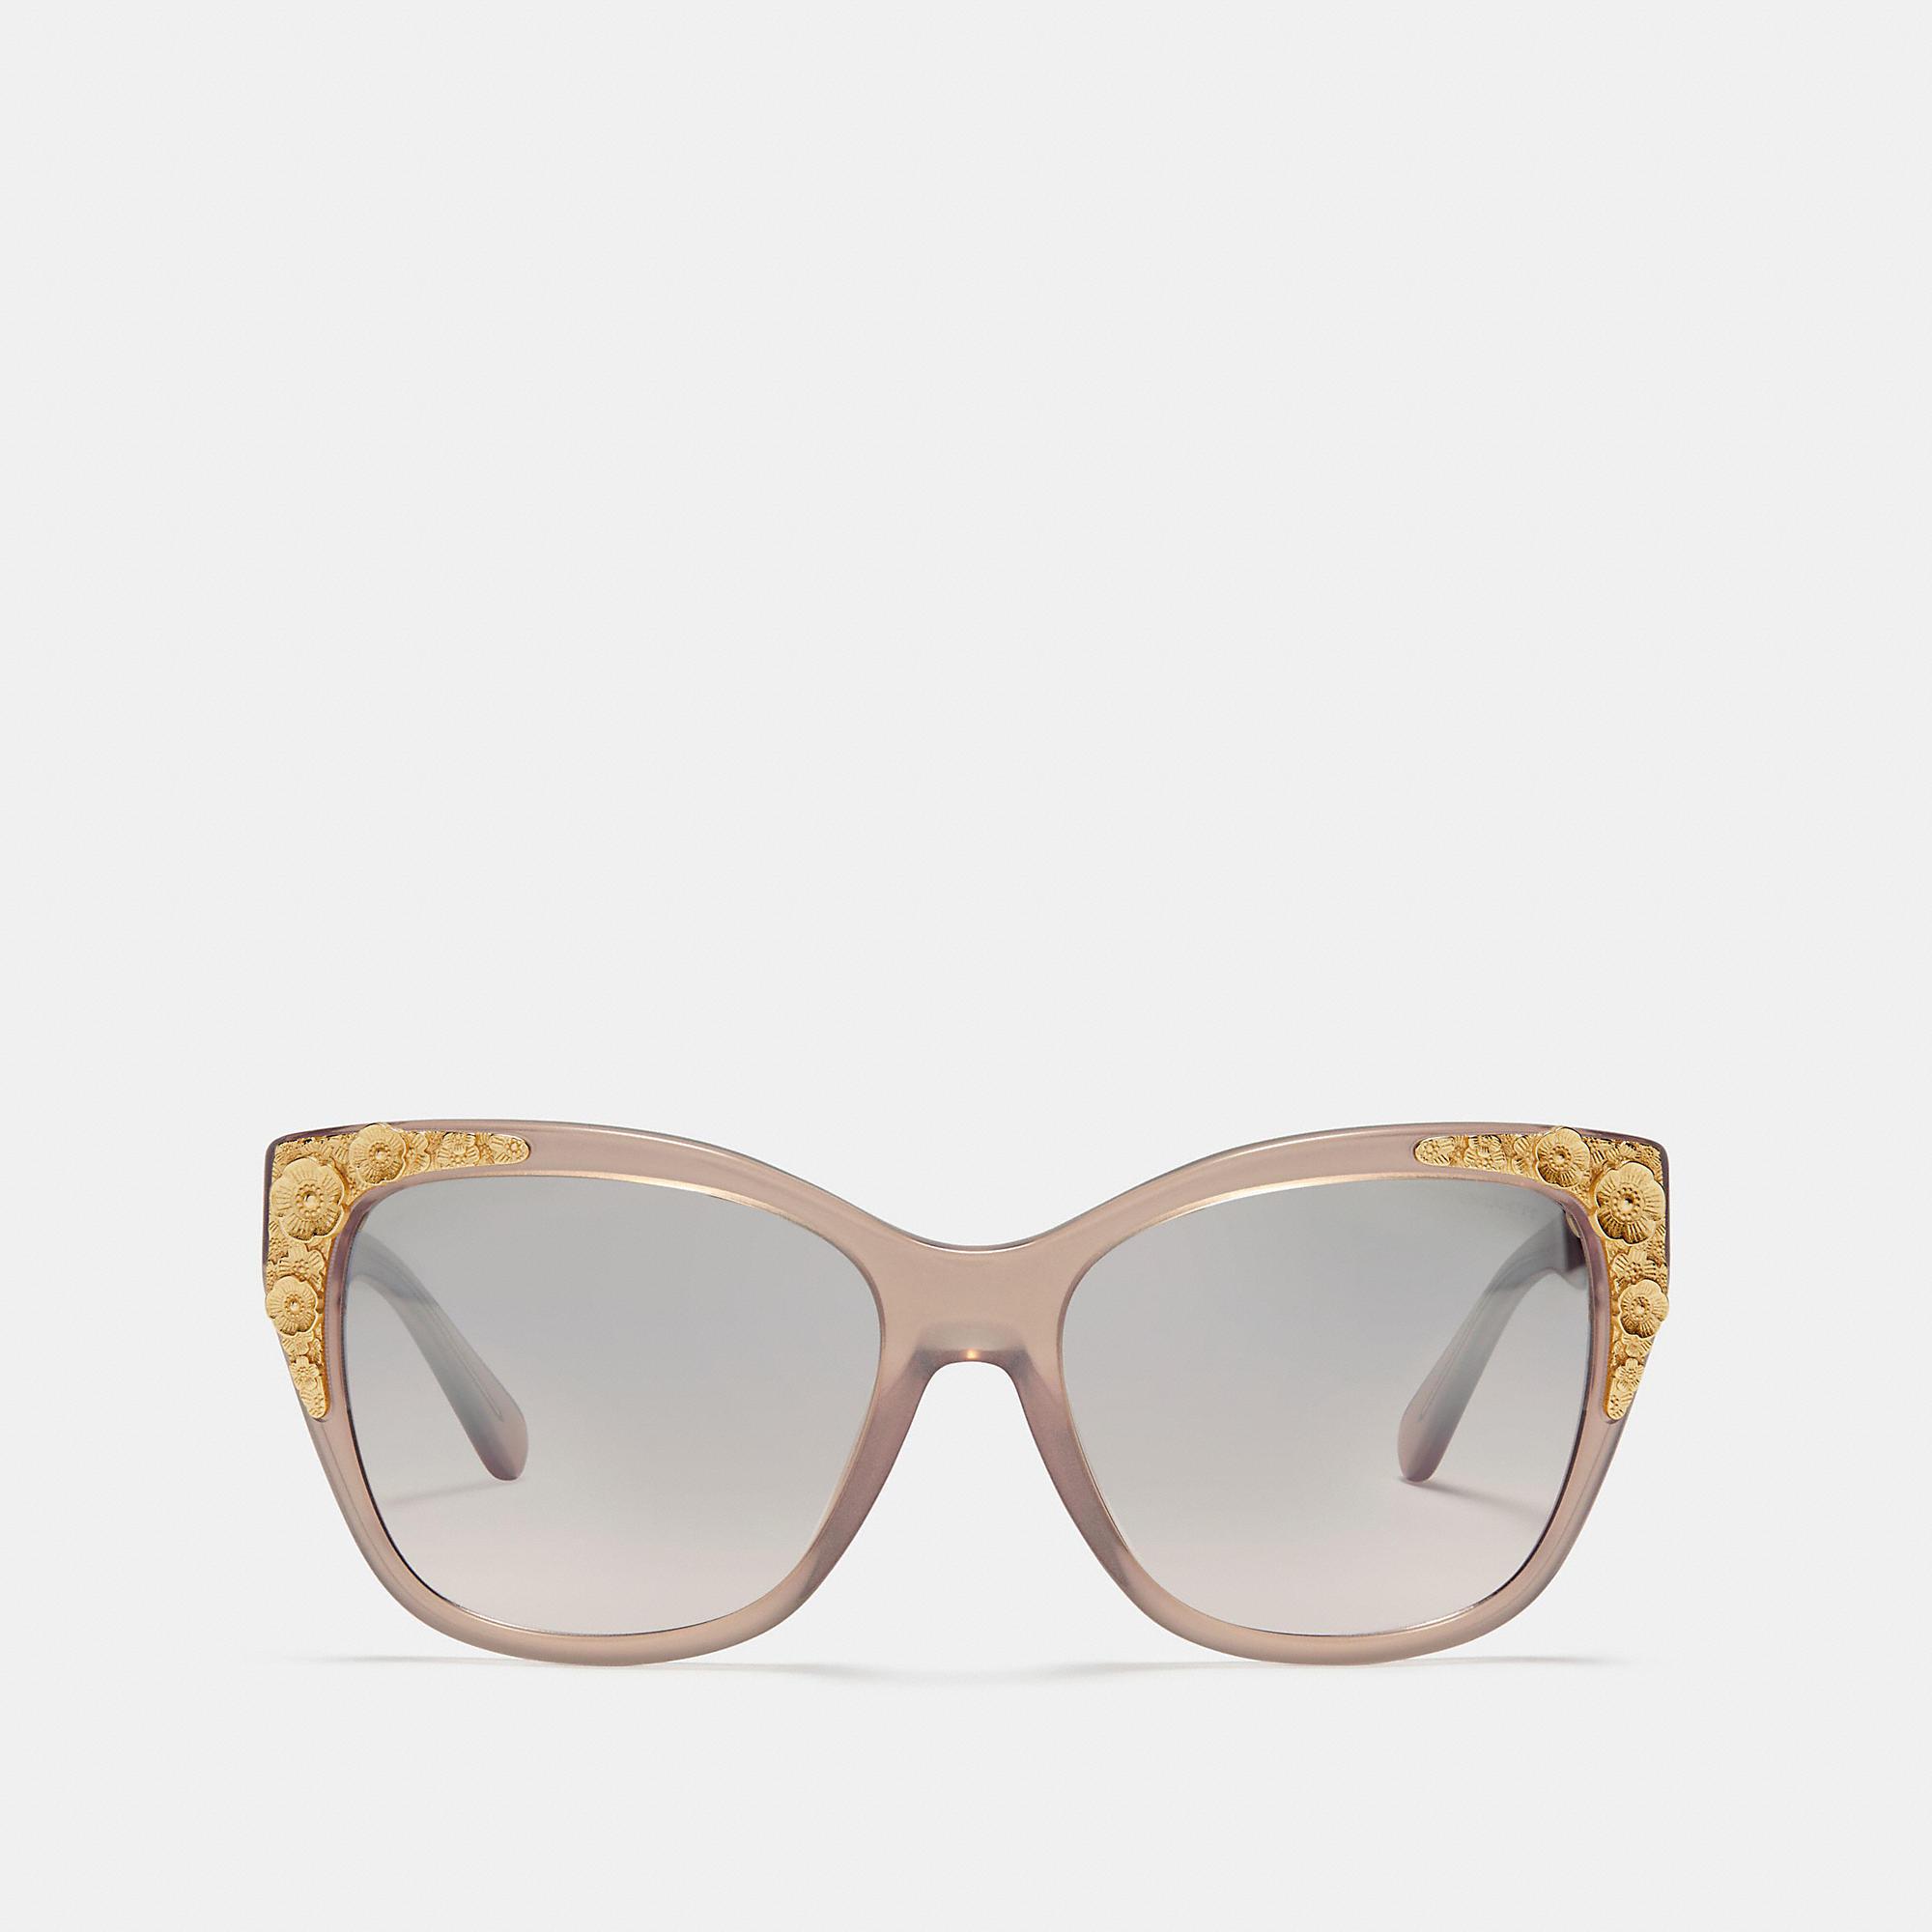 38e022048db COACH Metal Tea Rose Square Sunglasses - Women s Sunwear